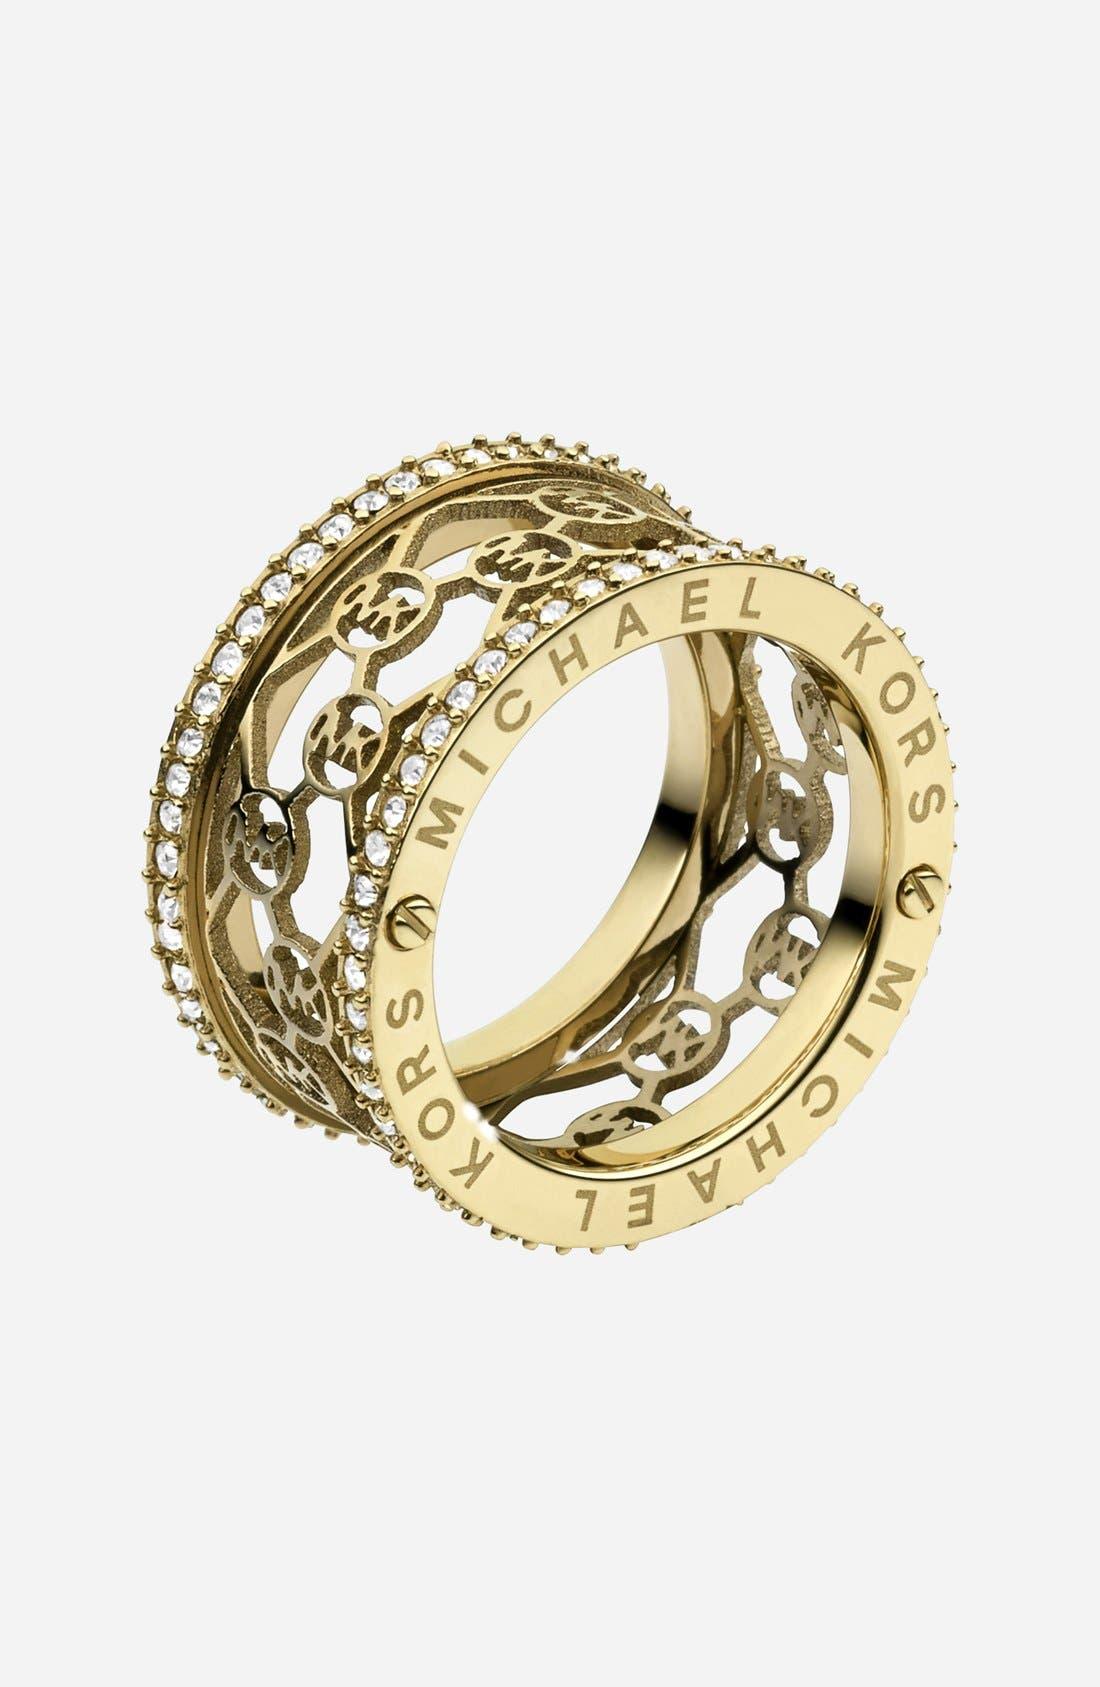 Main Image - Michael Kors 'Monogram' Logo Cigar Band Ring